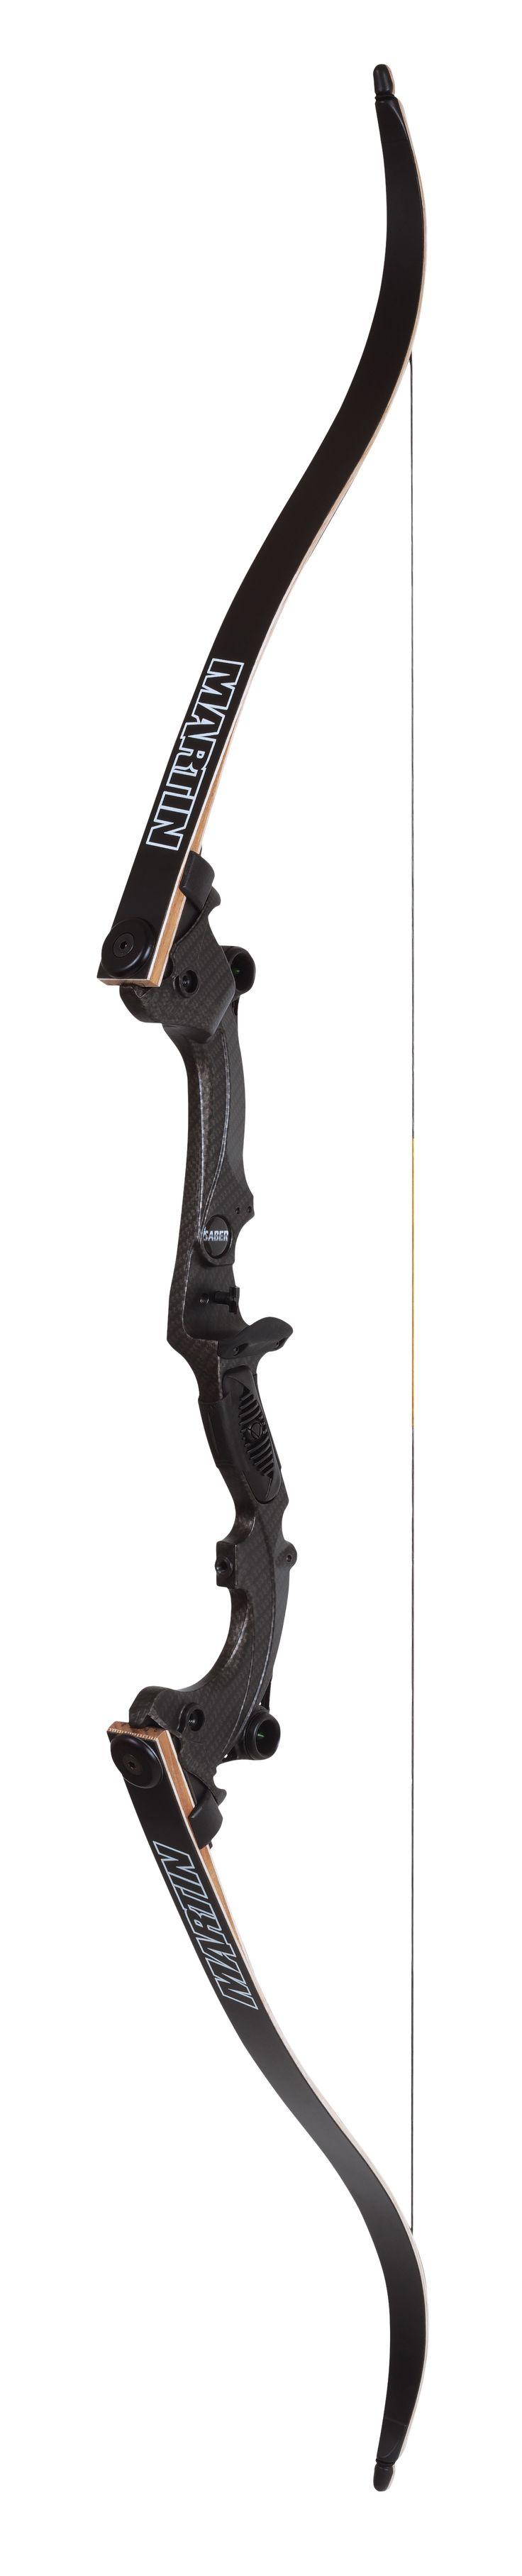 martin saber archery pinterest chang 39 e 3 nice and. Black Bedroom Furniture Sets. Home Design Ideas